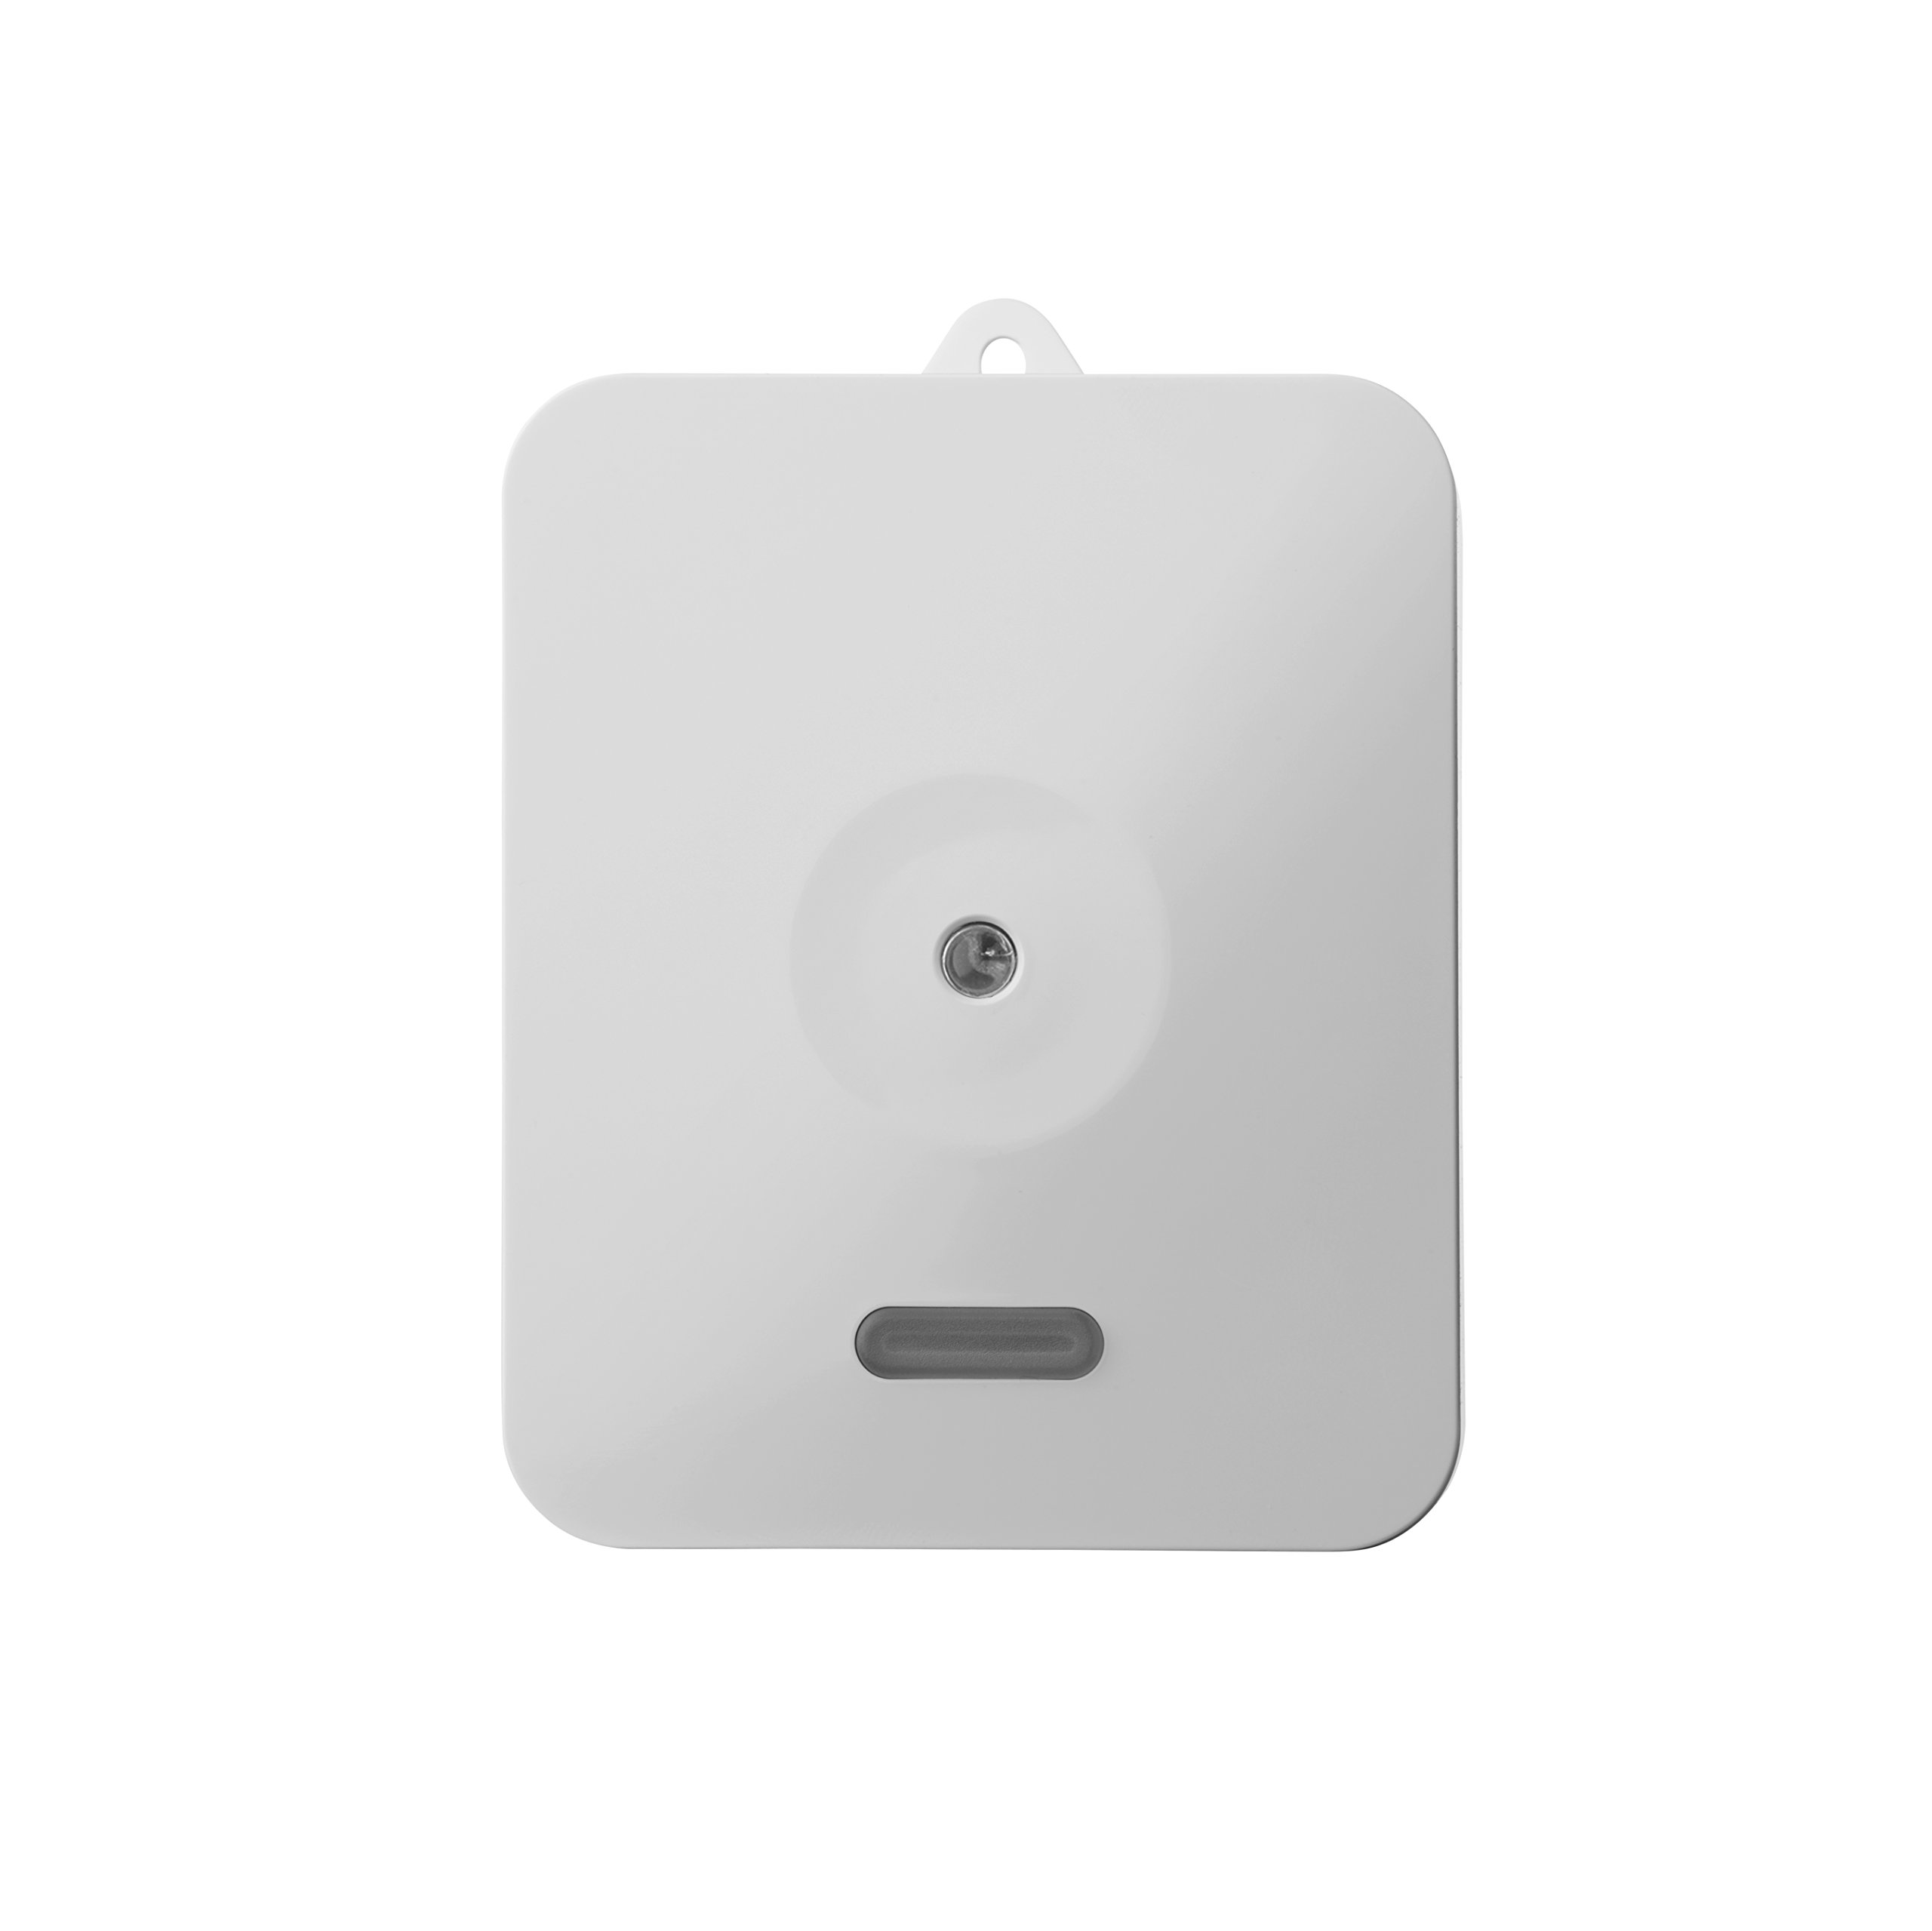 Ecolink Zwave Plus Network Security Siren, White (SC-ZWAVE5-ECO)